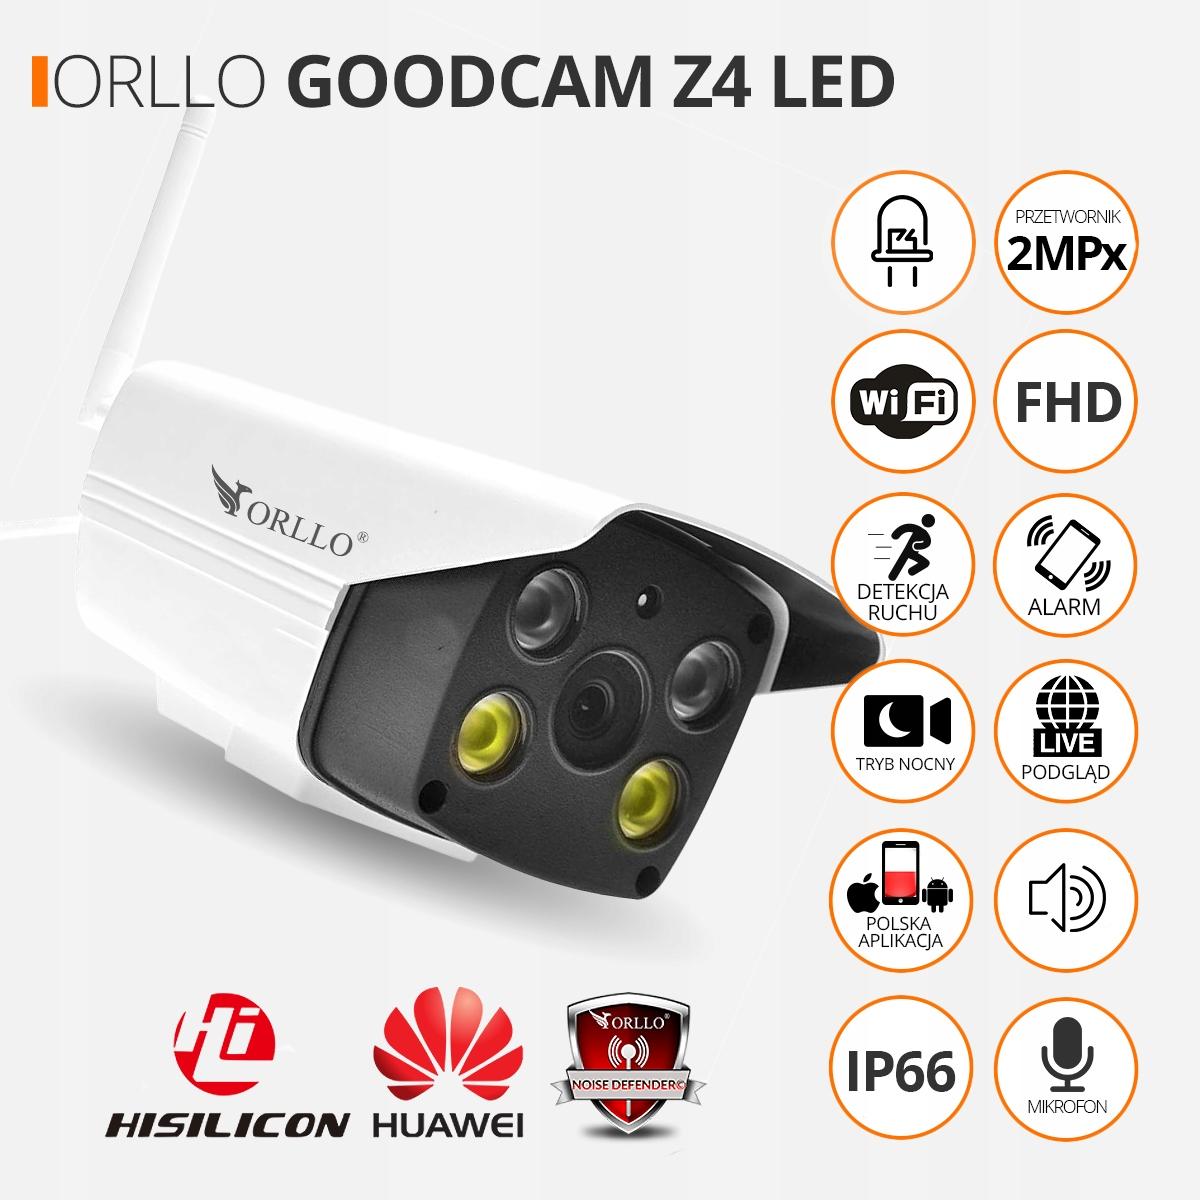 Kamera z Alarmem Zewnętrzna WiFi SYRENA + K. 64 GB Marka Orllo